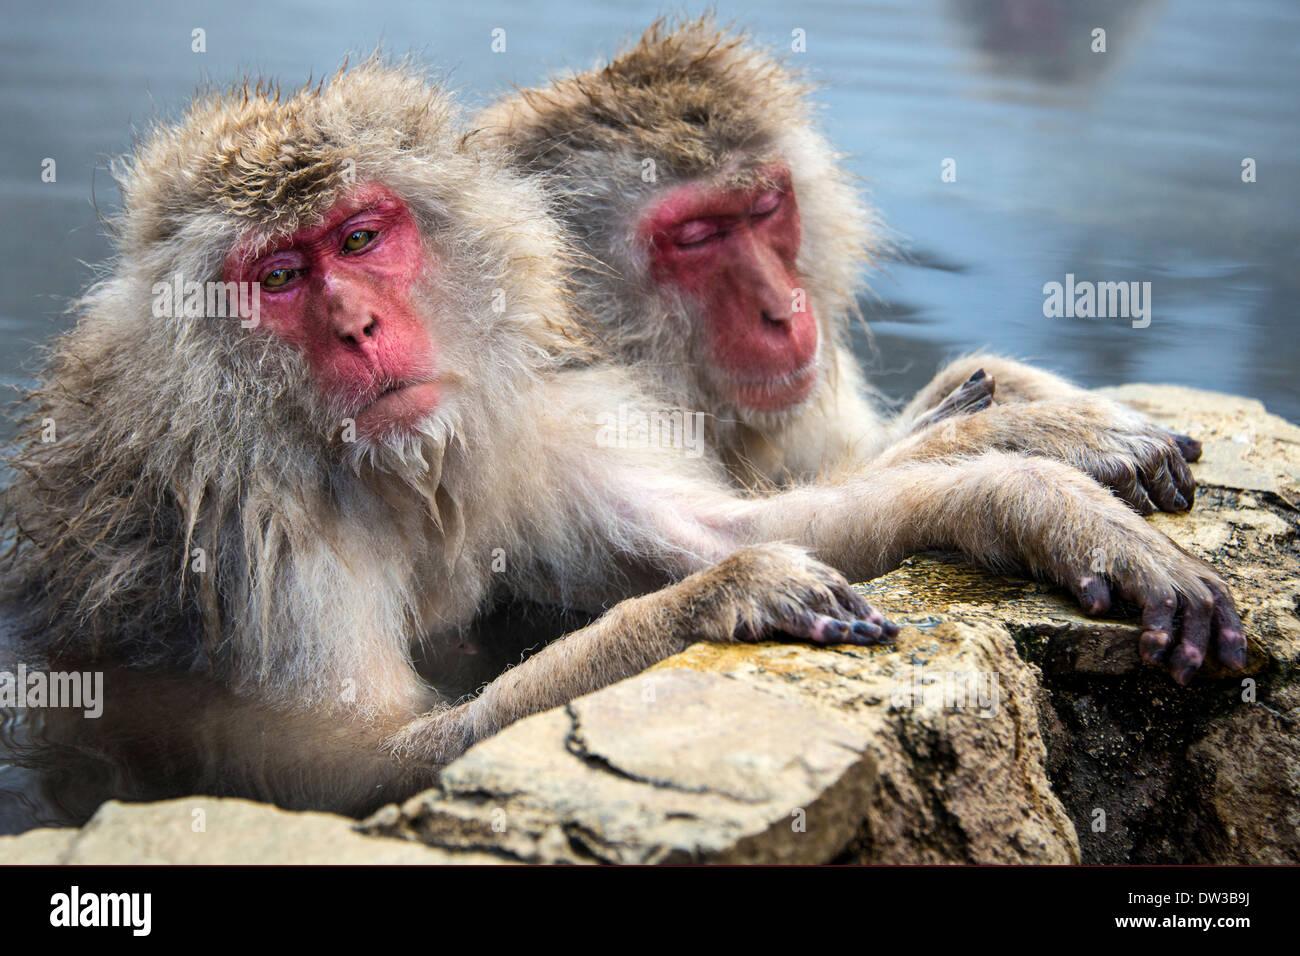 Neve giapponese scimmie in Nagano, Giappone. Immagini Stock